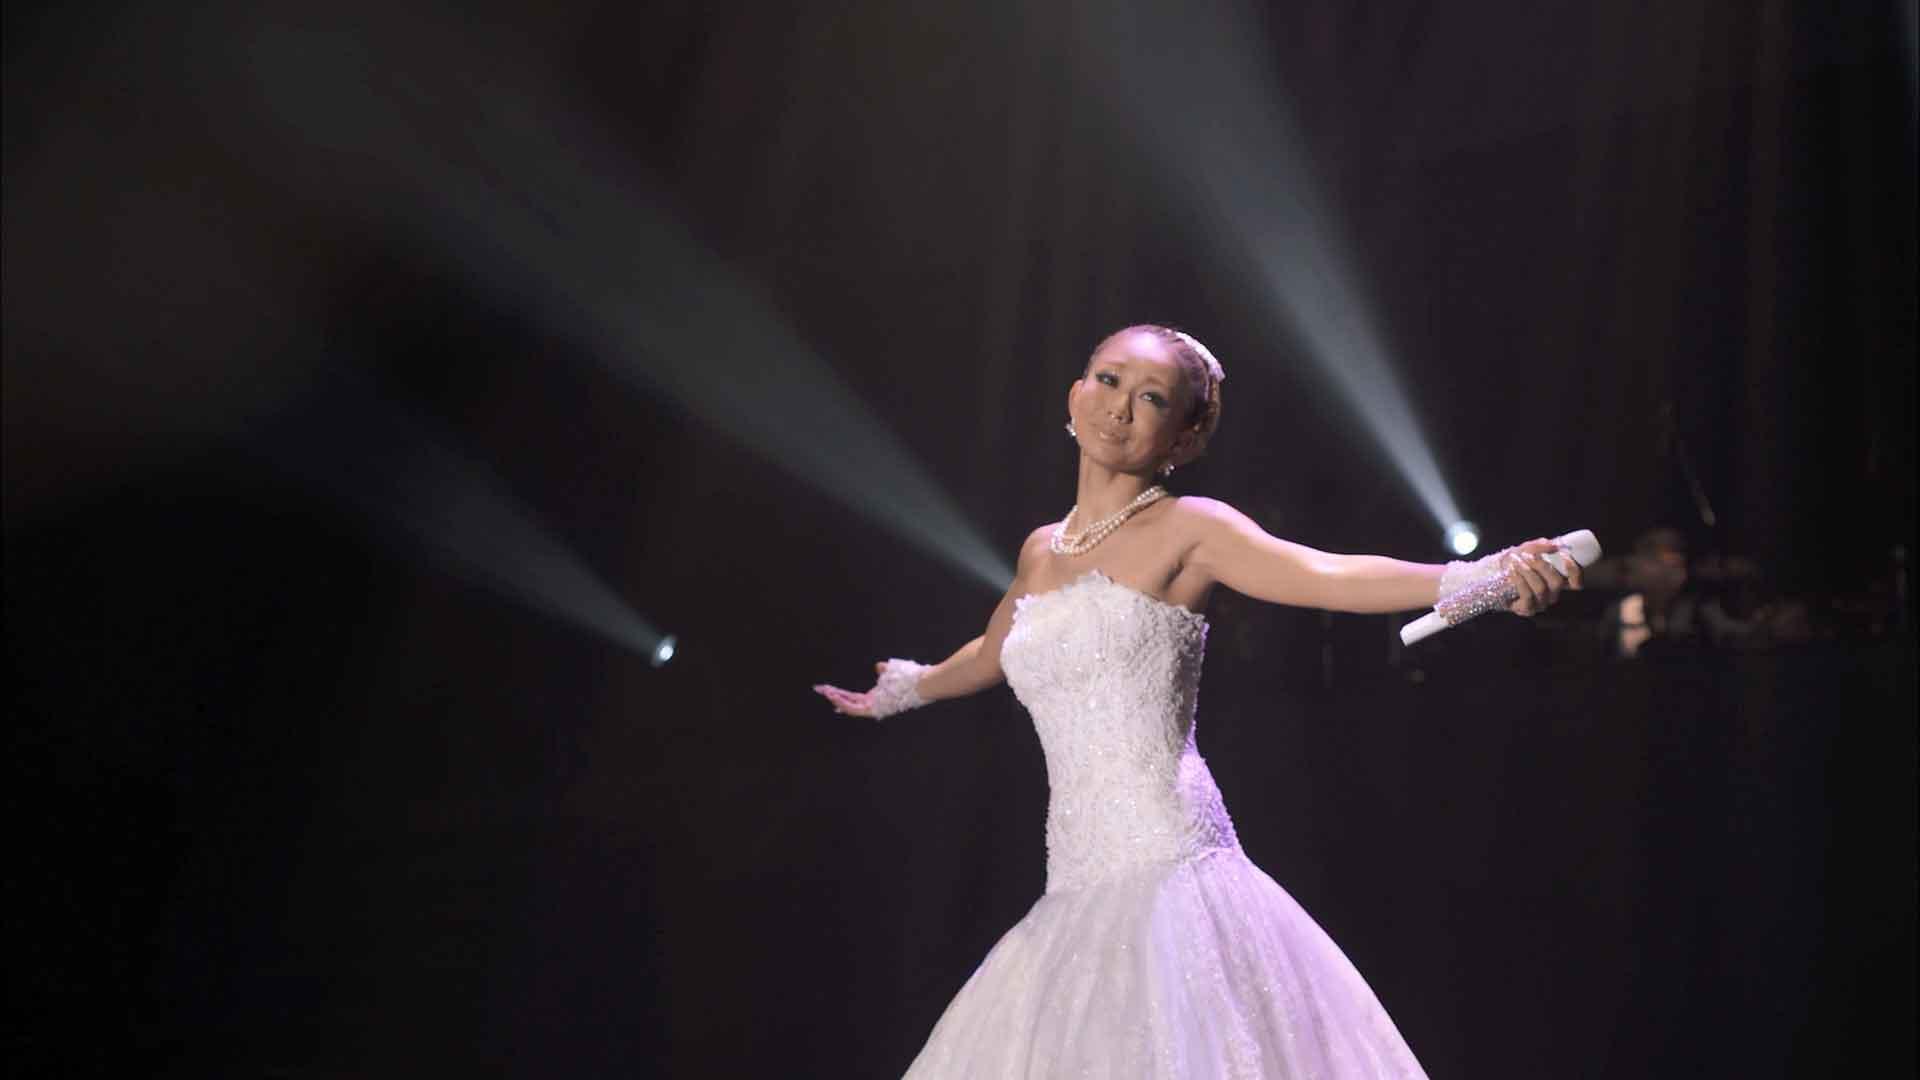 [蓝光原盘] 幸田来未 15周年纪念演唱会2015 Koda Kumi 15th Anniversary Live《ISO 38.9 GB》